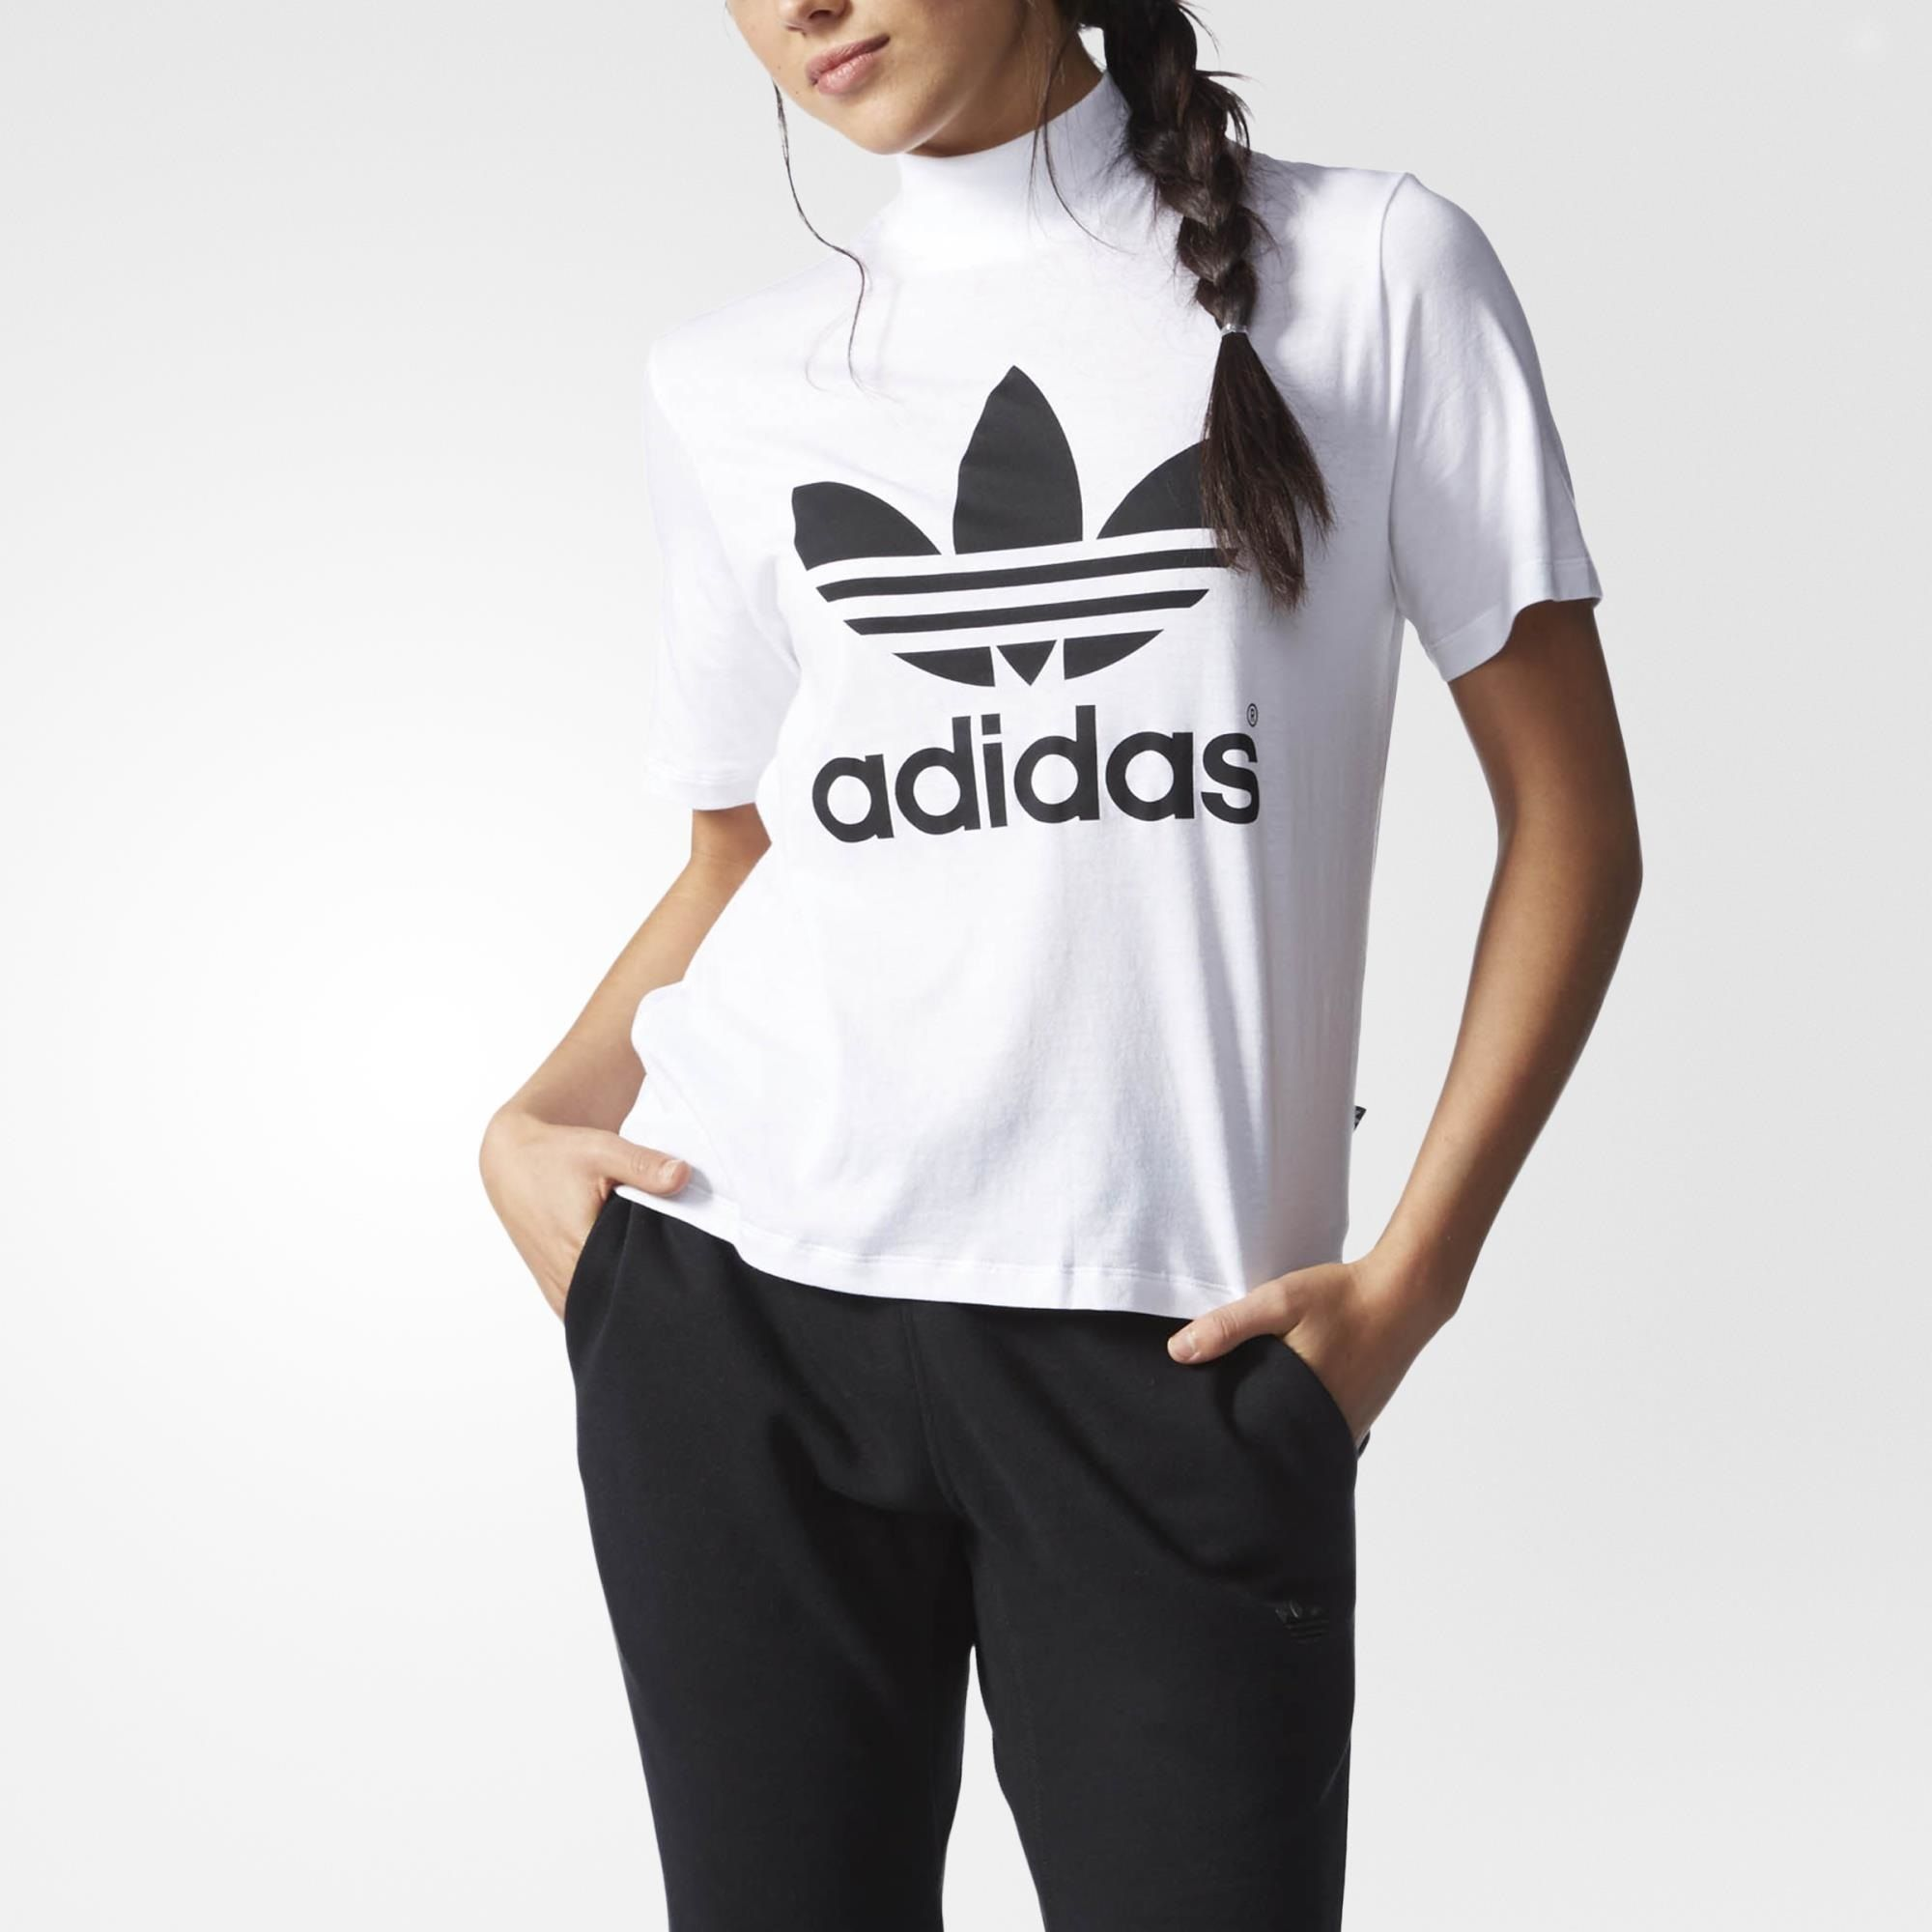 adidas t shirt berlin